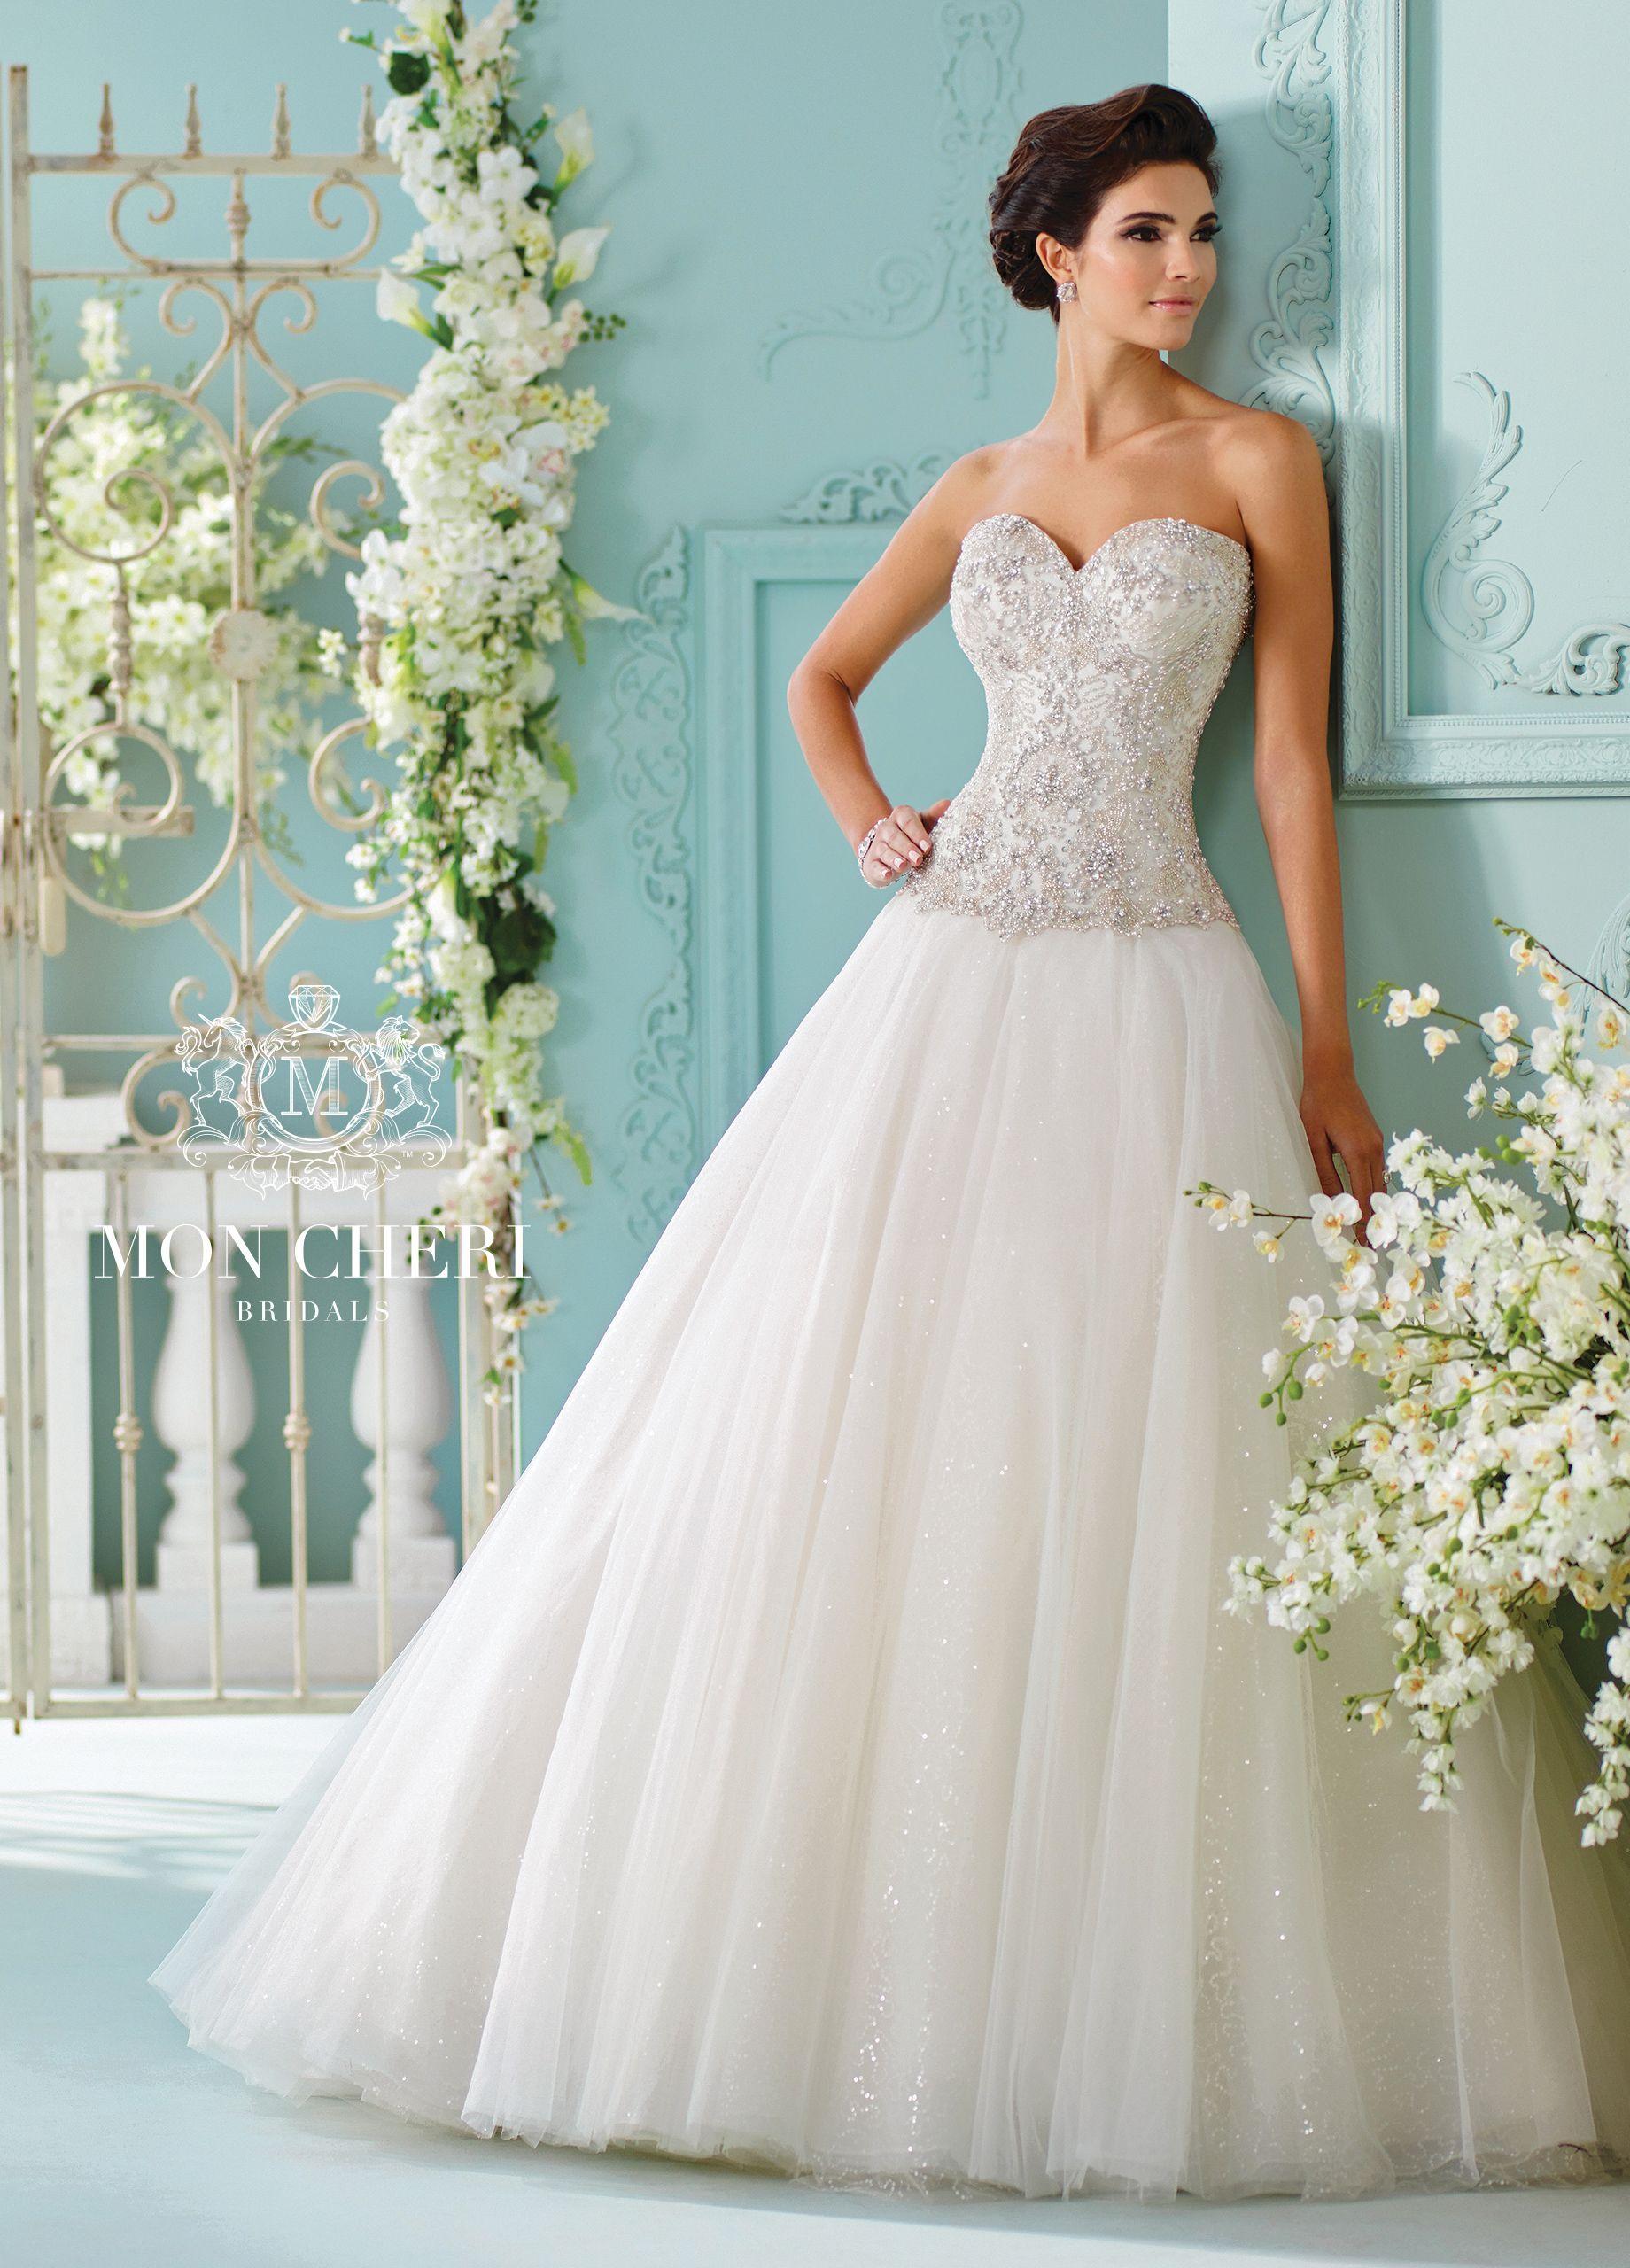 Strapless Tulle with Swarovski Crystals Wedding Dress- 216258 Saphia